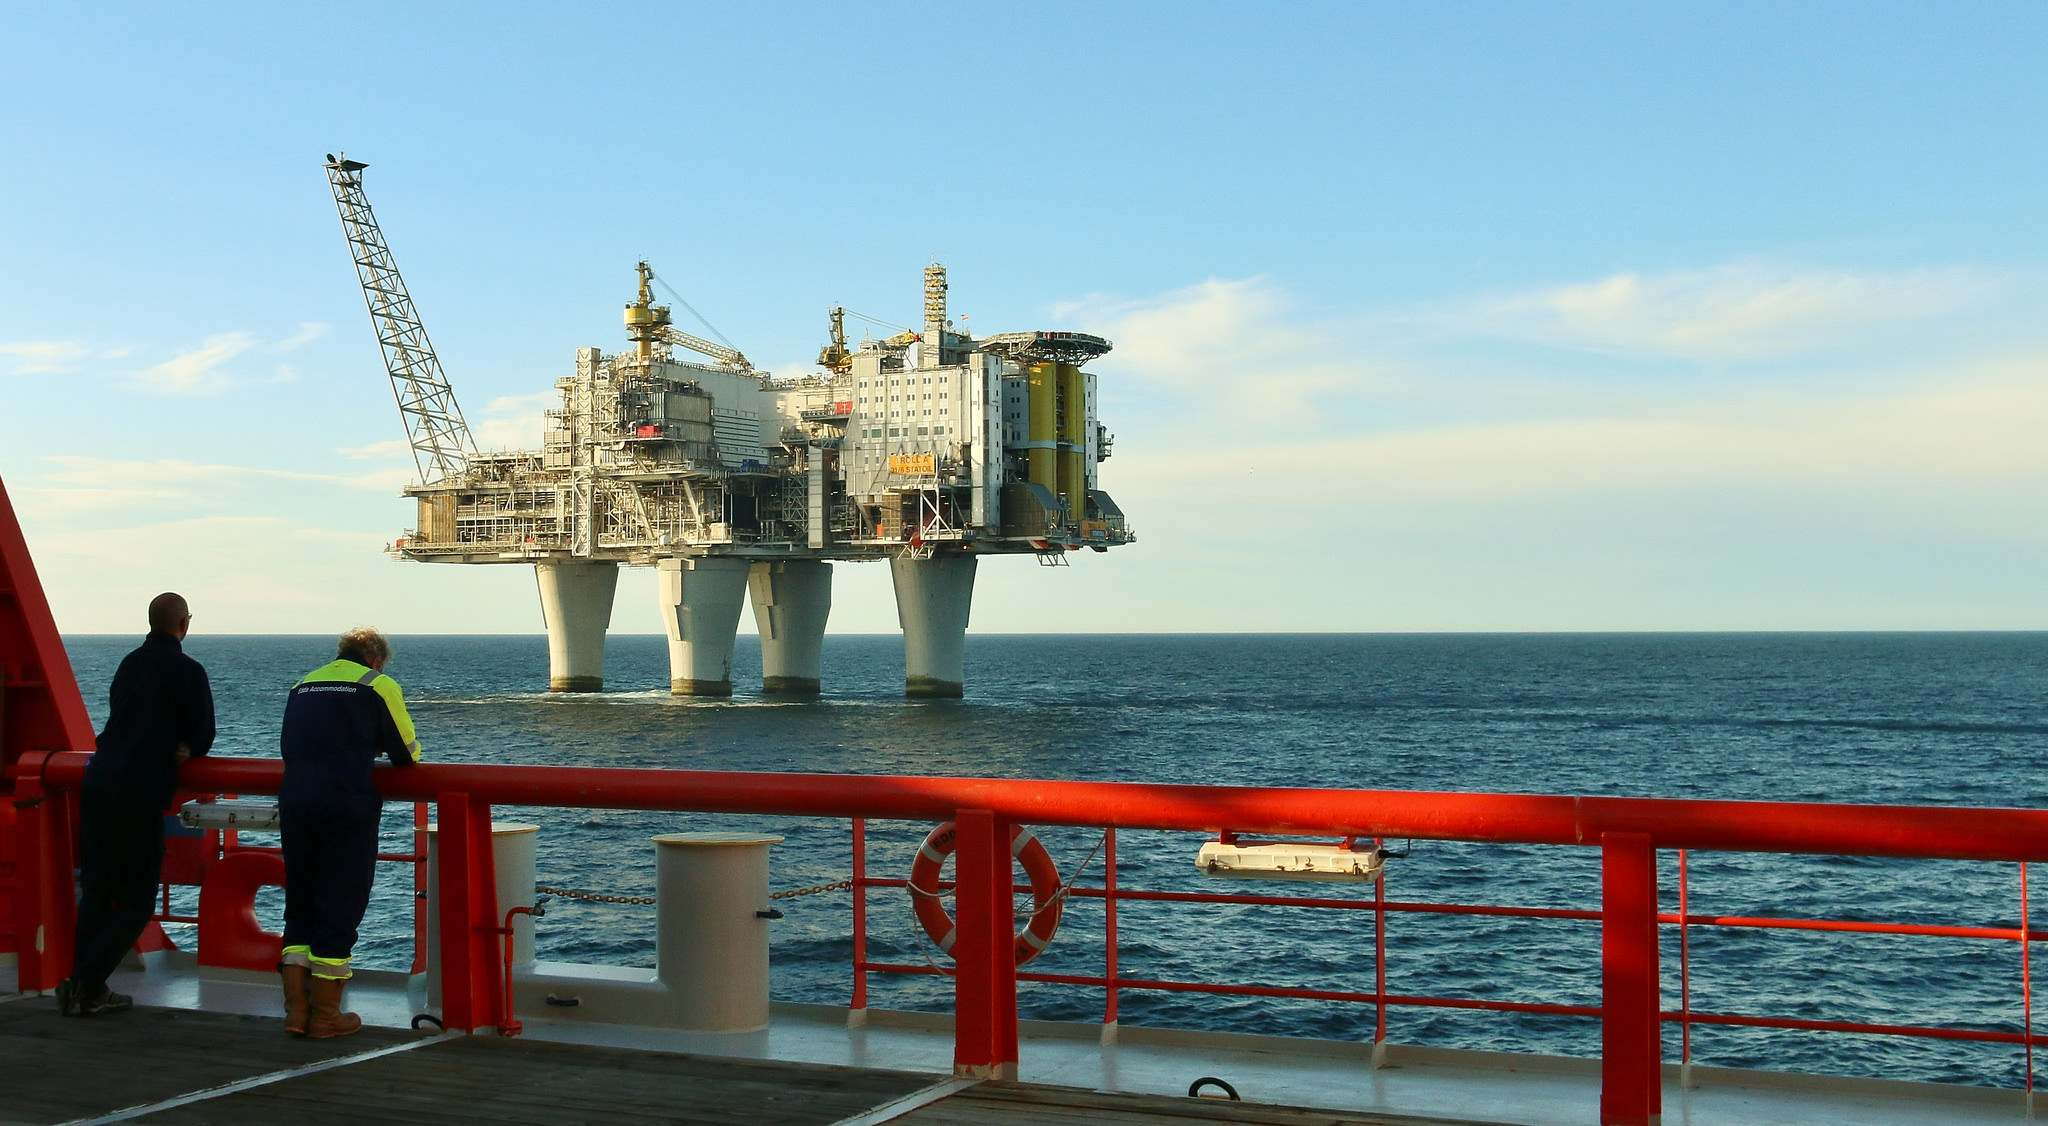 troll a1 Megastructure   Troll A Gas Platform, Norway